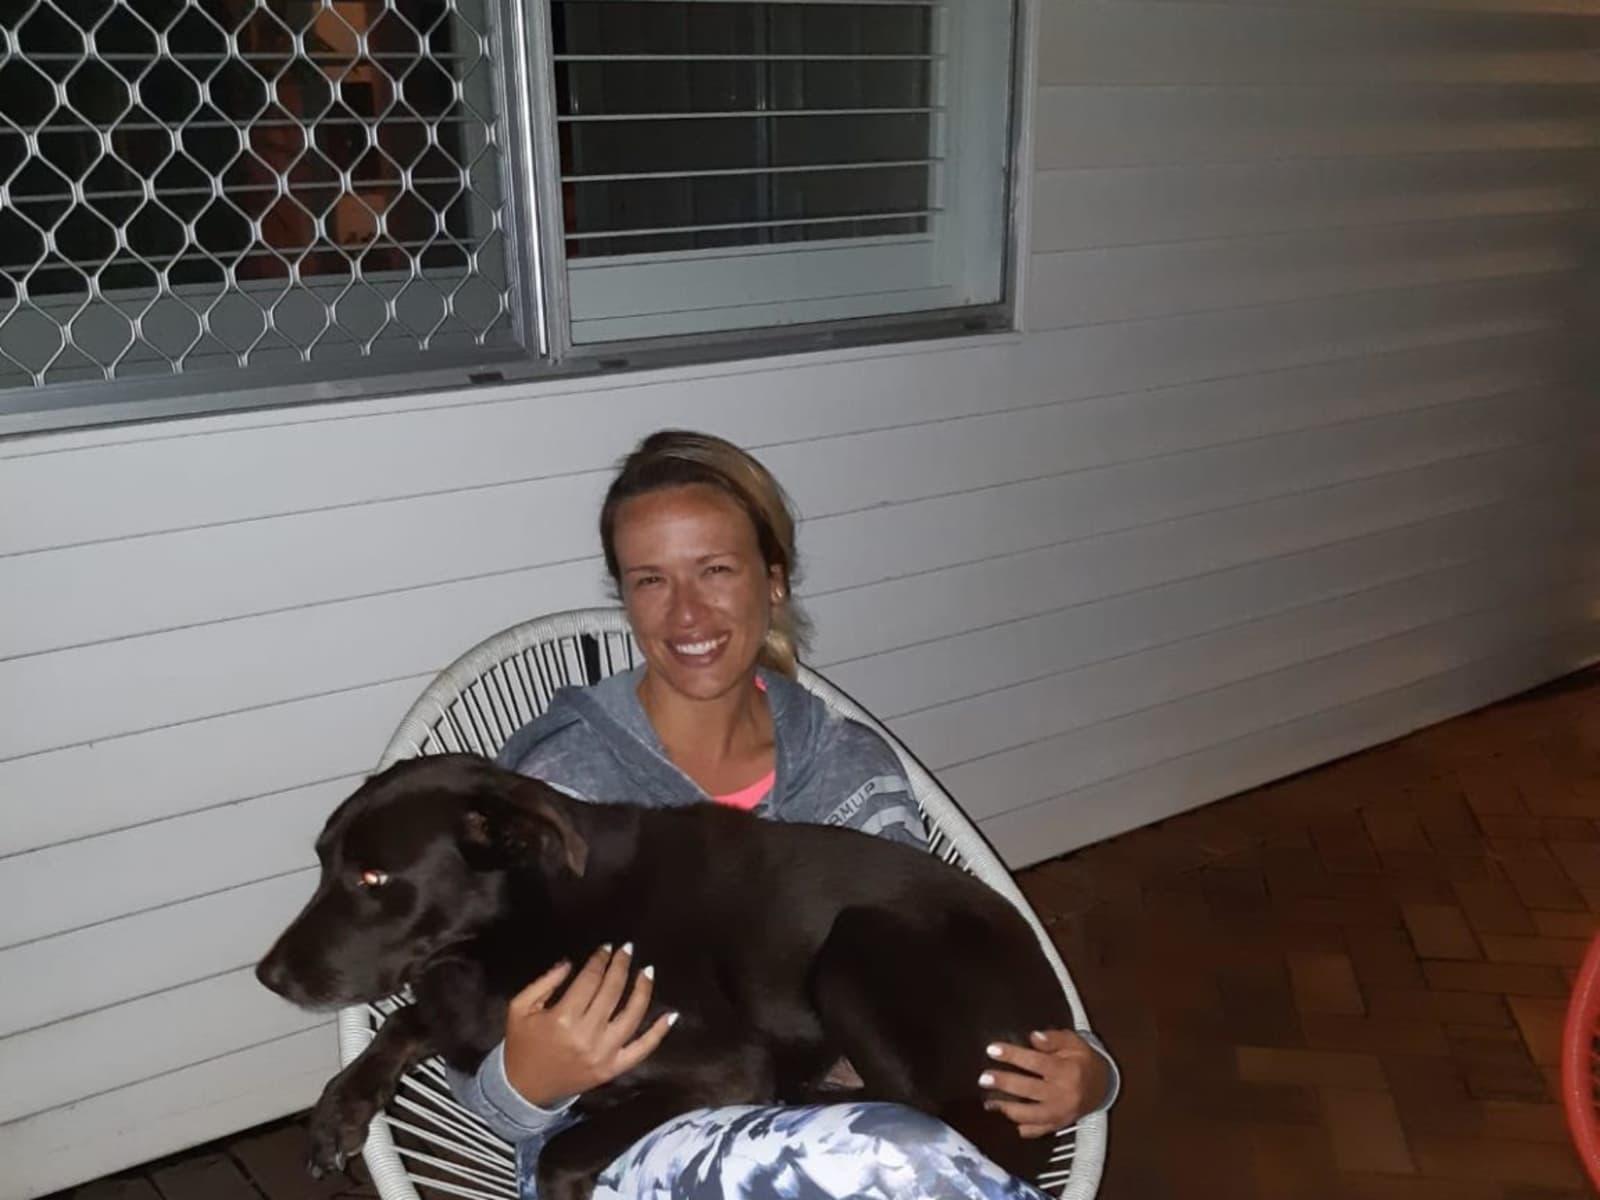 Sarah from Melbourne, Victoria, Australia